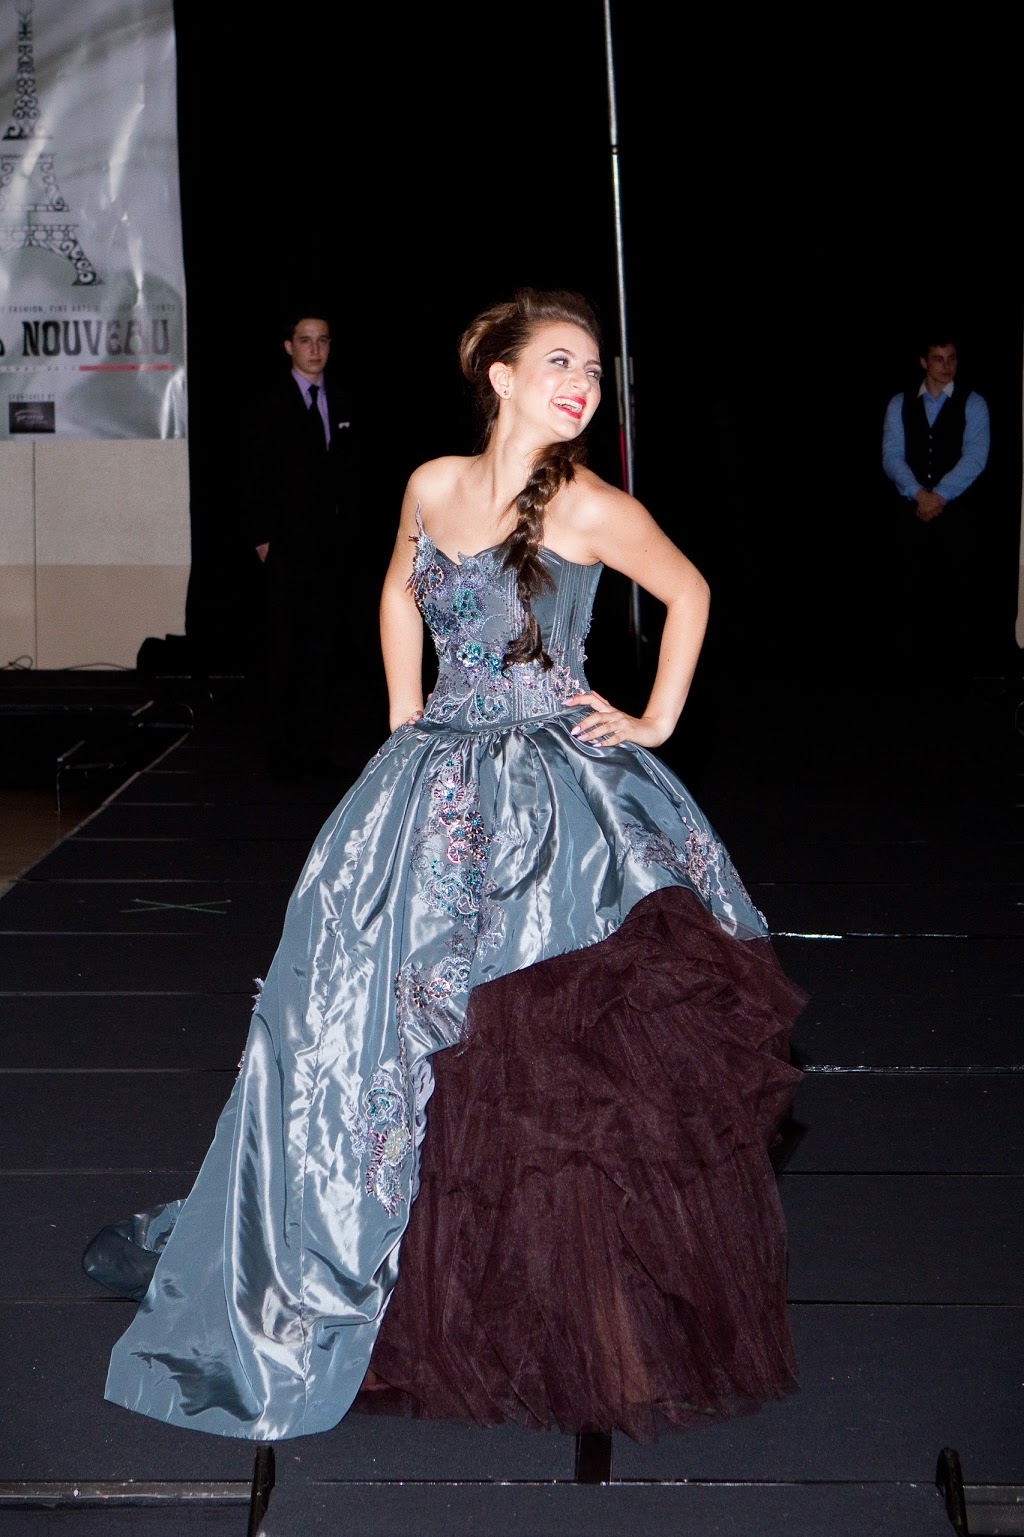 Haute Couture Academy Of Fashion Fine Arts Design 8099 Weston Rd 10 Woodbridge On L4l 2v5 Canada